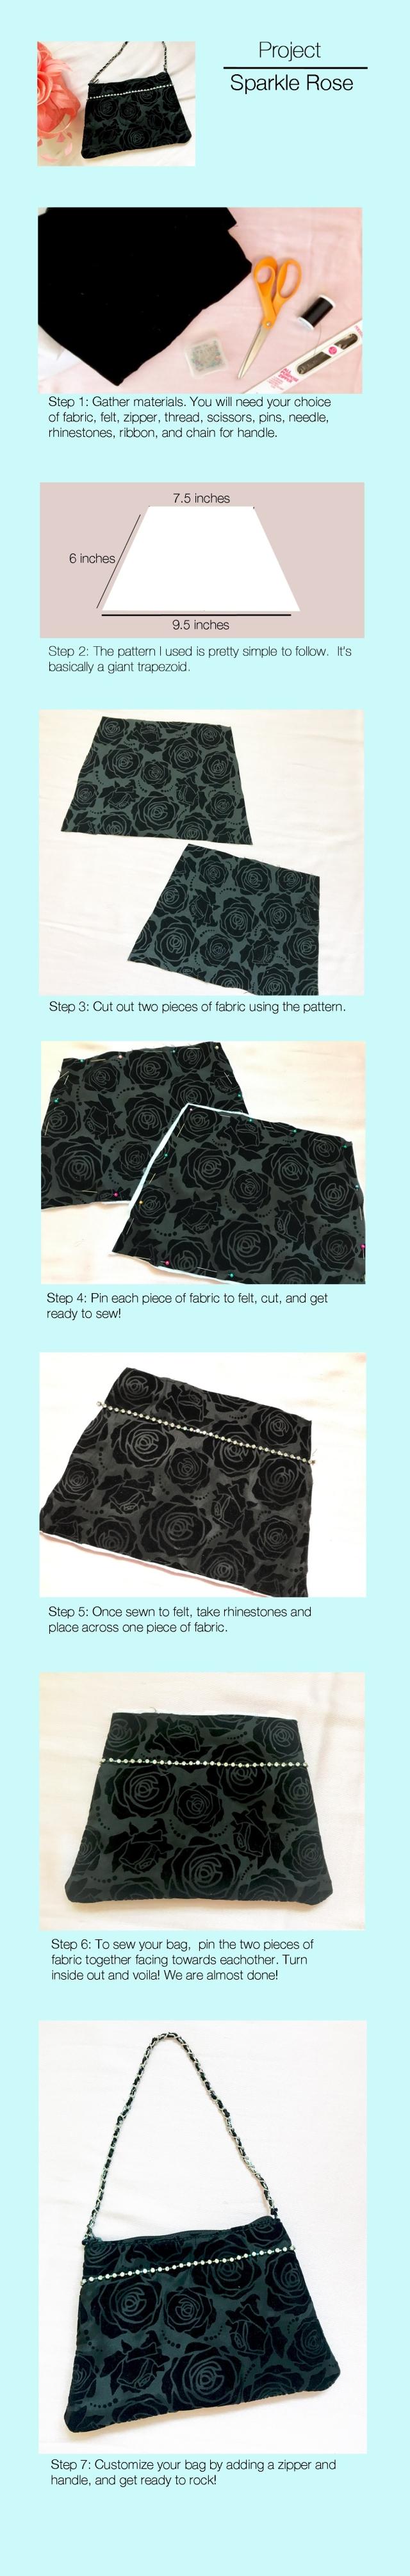 sparkle-rose-4.jpg